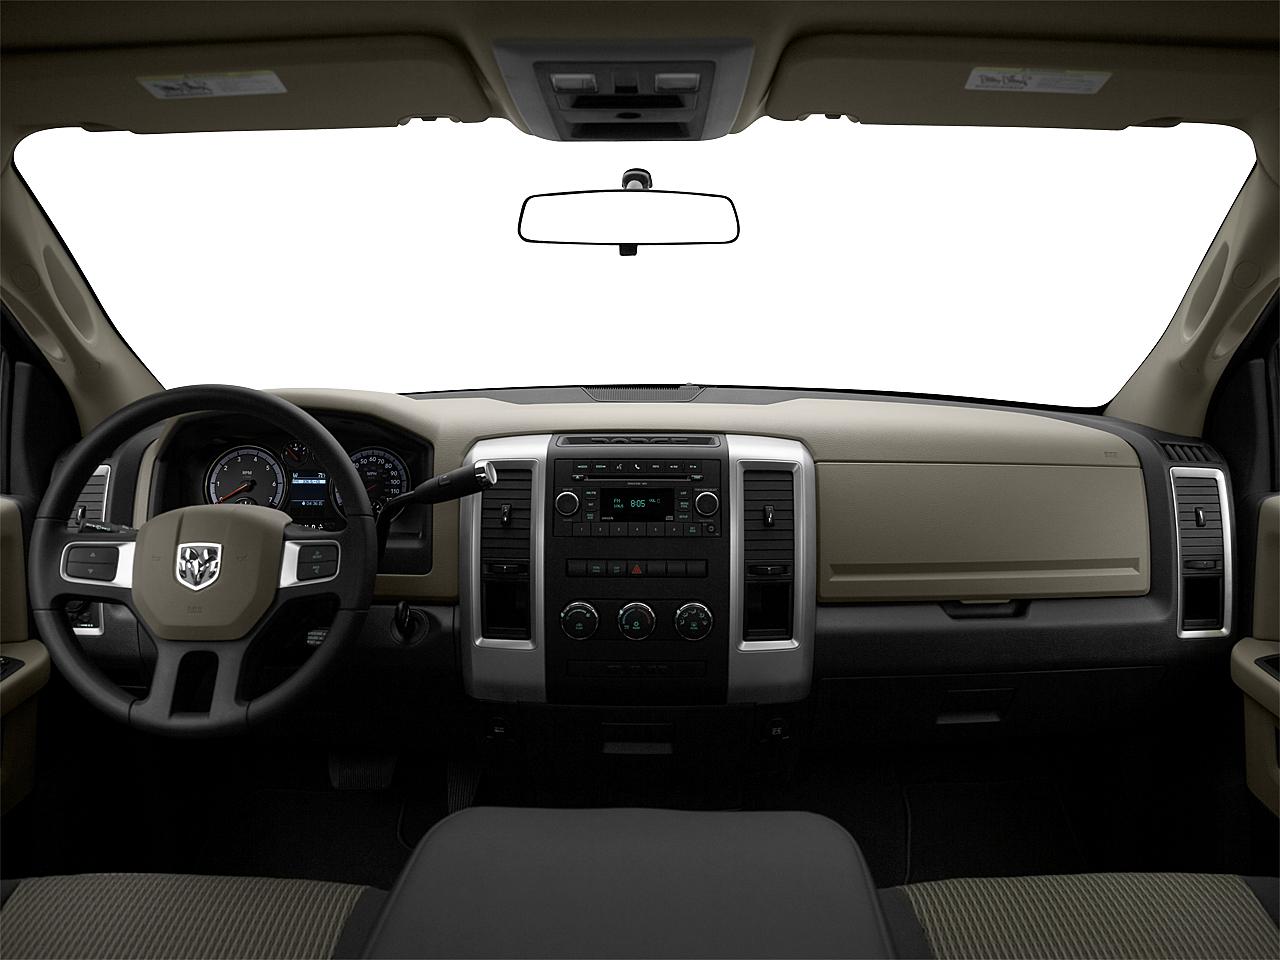 2010 dodge ram pickup 1500 recalls view all recalls autos post. Black Bedroom Furniture Sets. Home Design Ideas